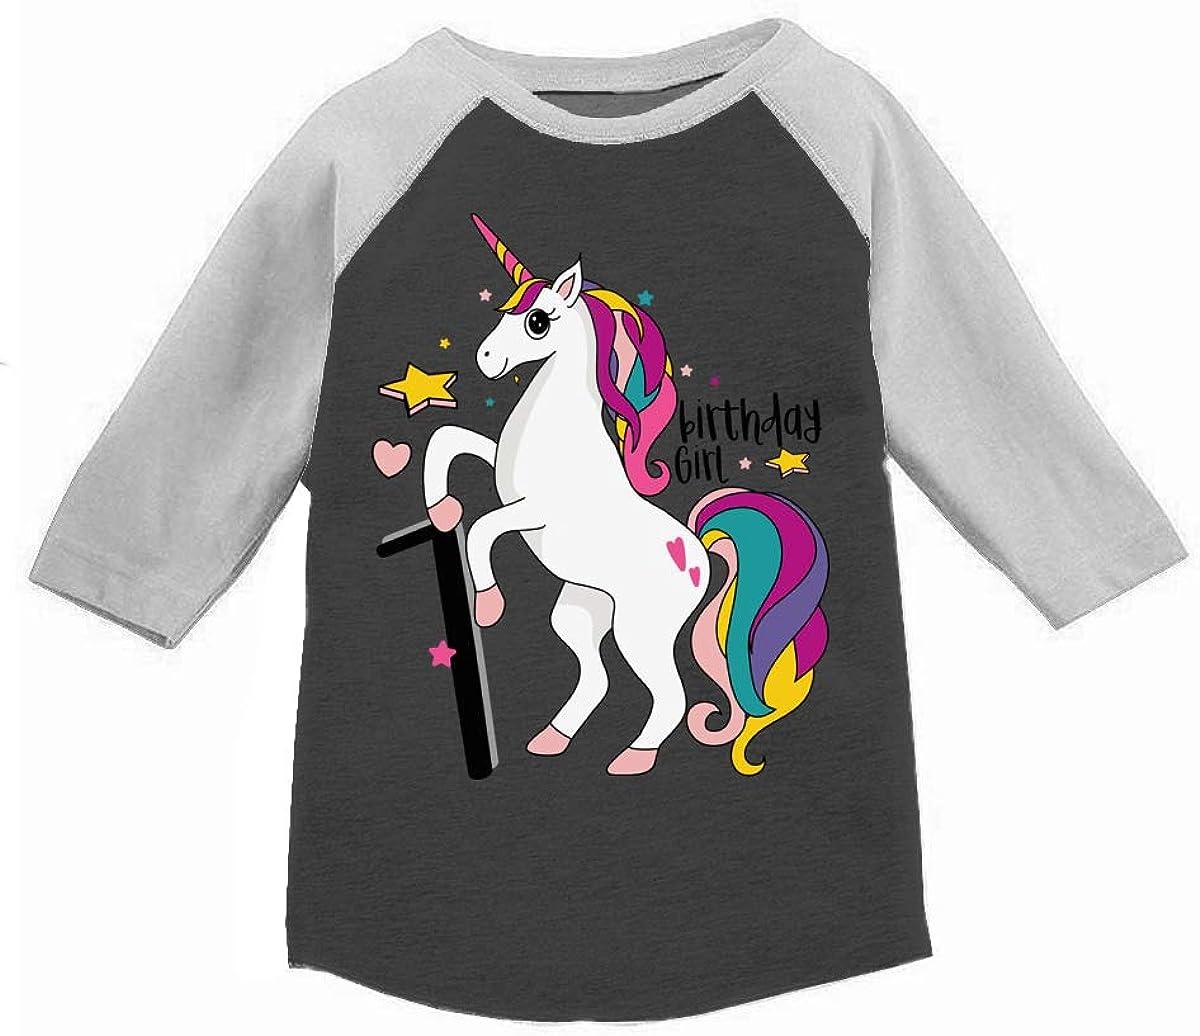 Fzjy Wnx Boxing Llama Boys Short-Sleeve Shirt